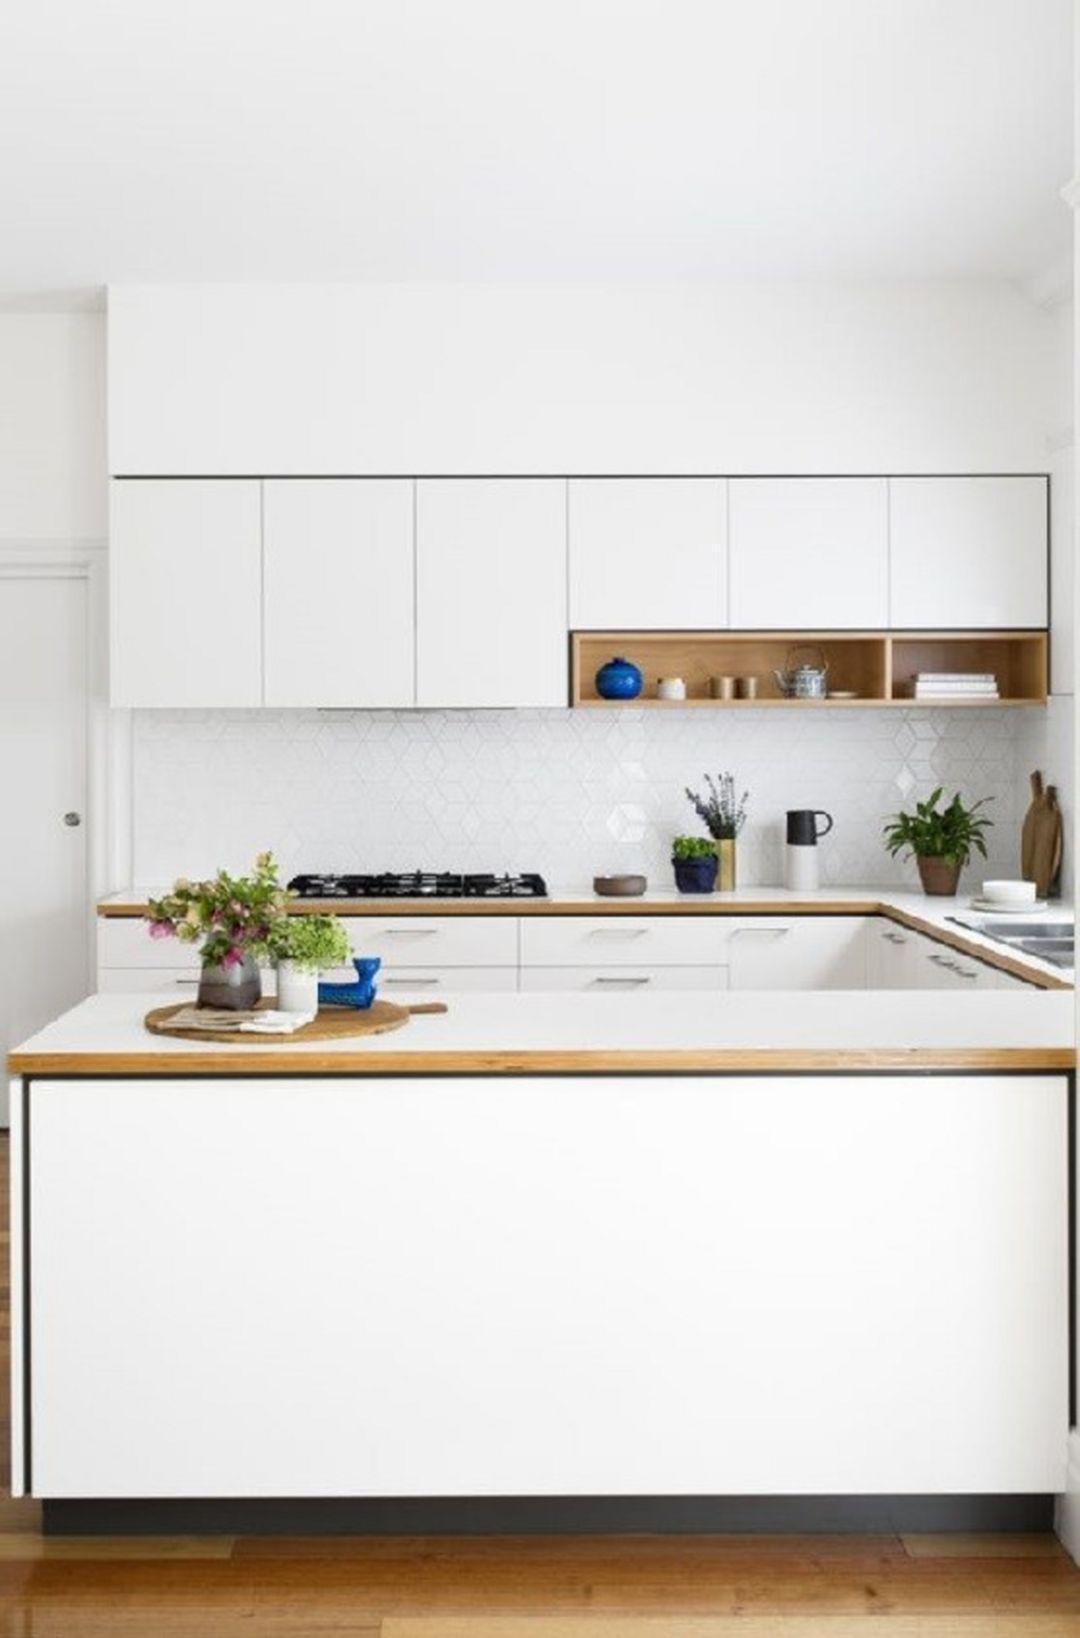 amazing here are 15 modern minimalist kitchen design ideas in 2019 minimalist kitchen on kitchen ideas minimalist id=50759